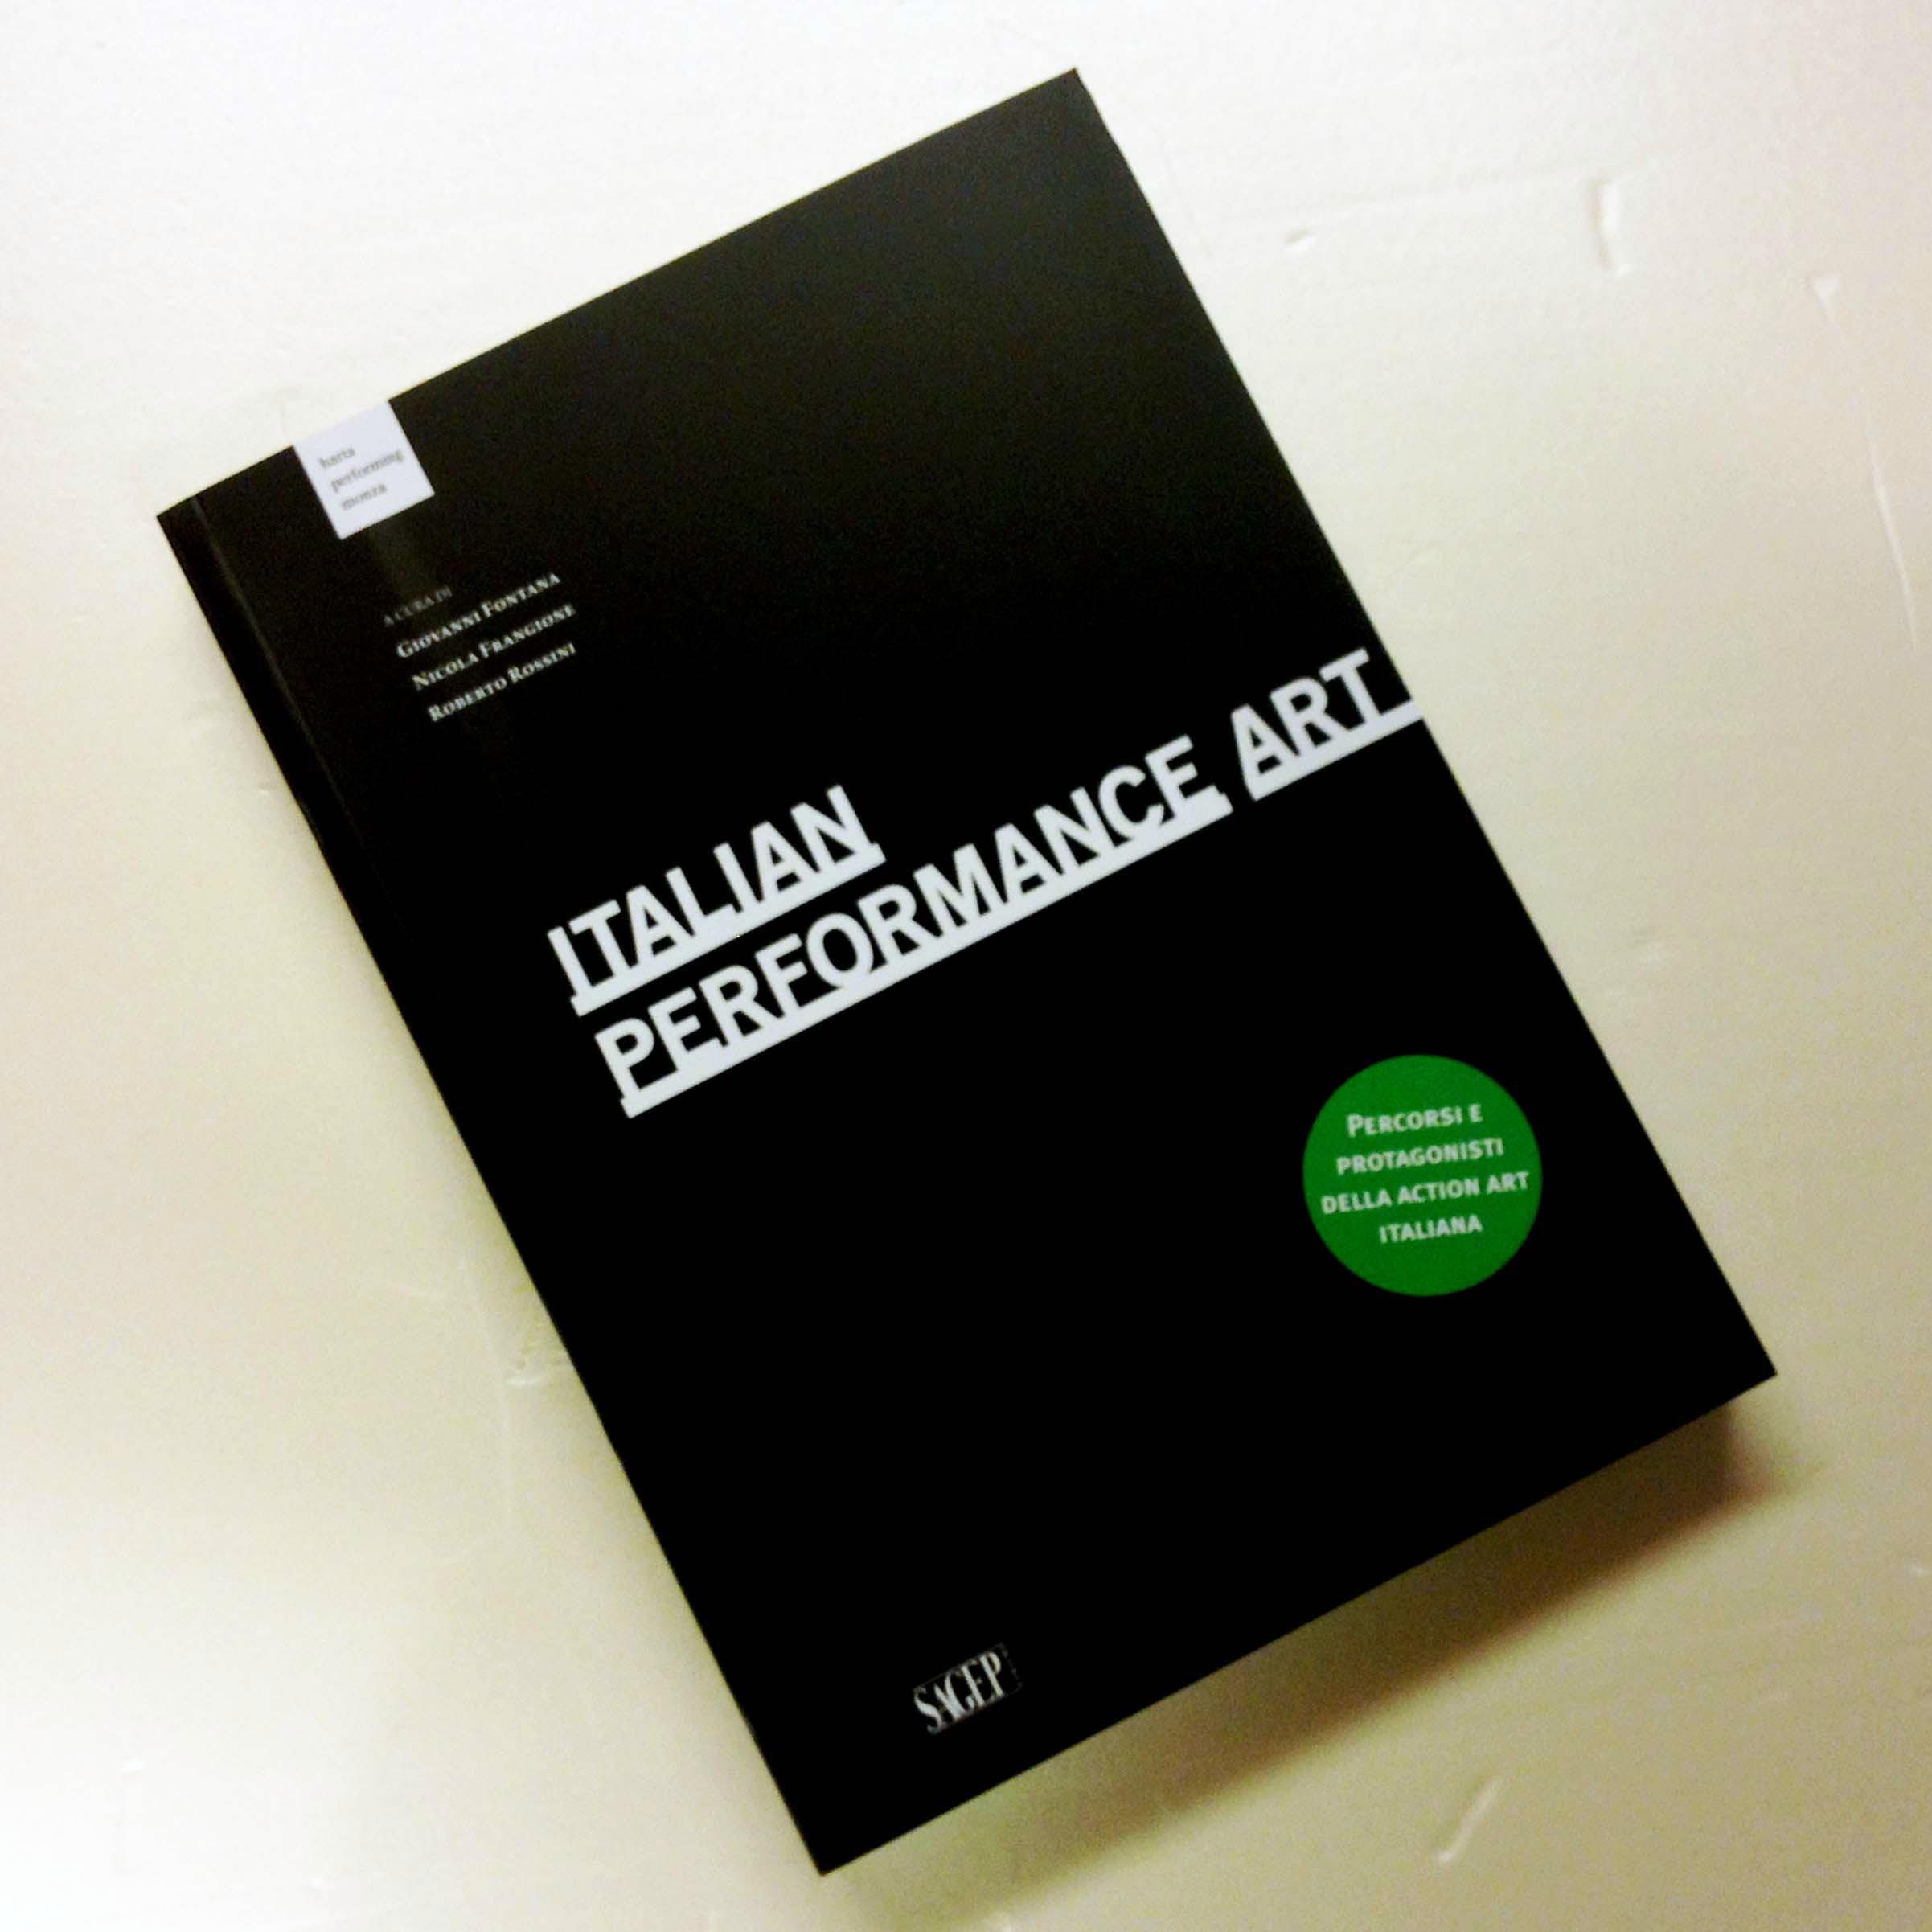 italian performance art ESCAPE='HTML'